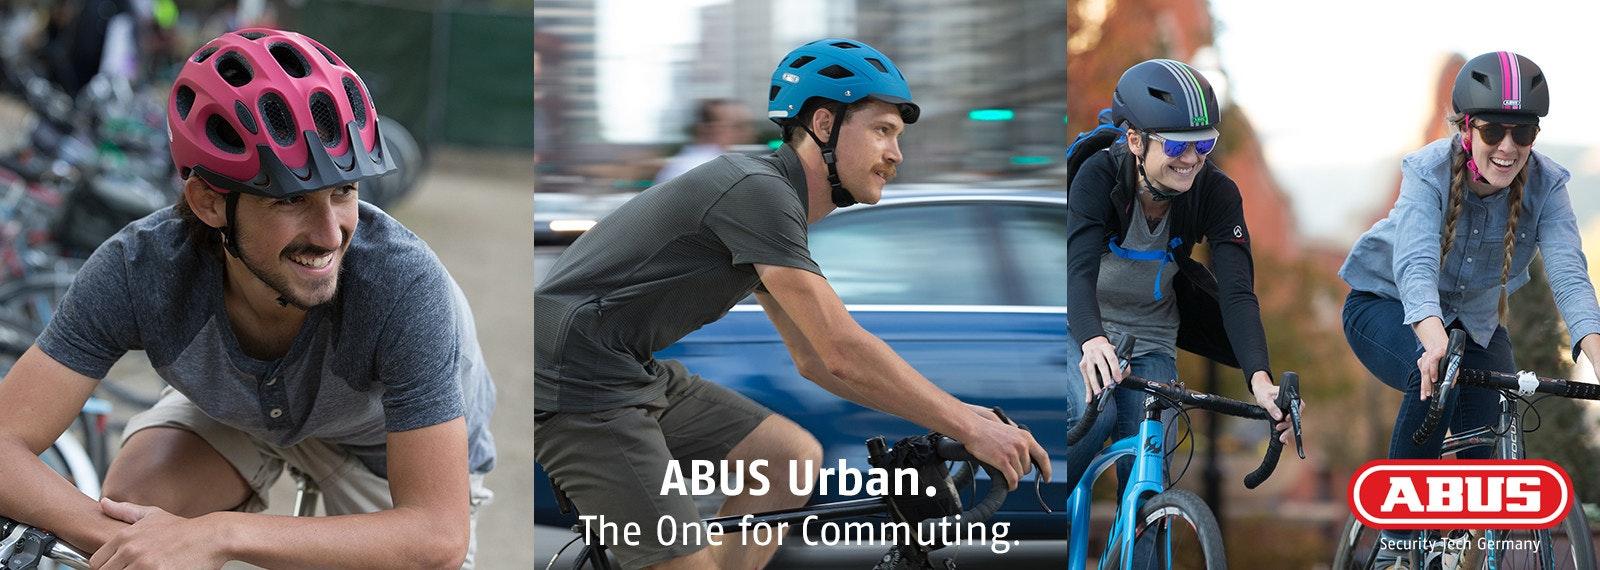 ABUS Urban